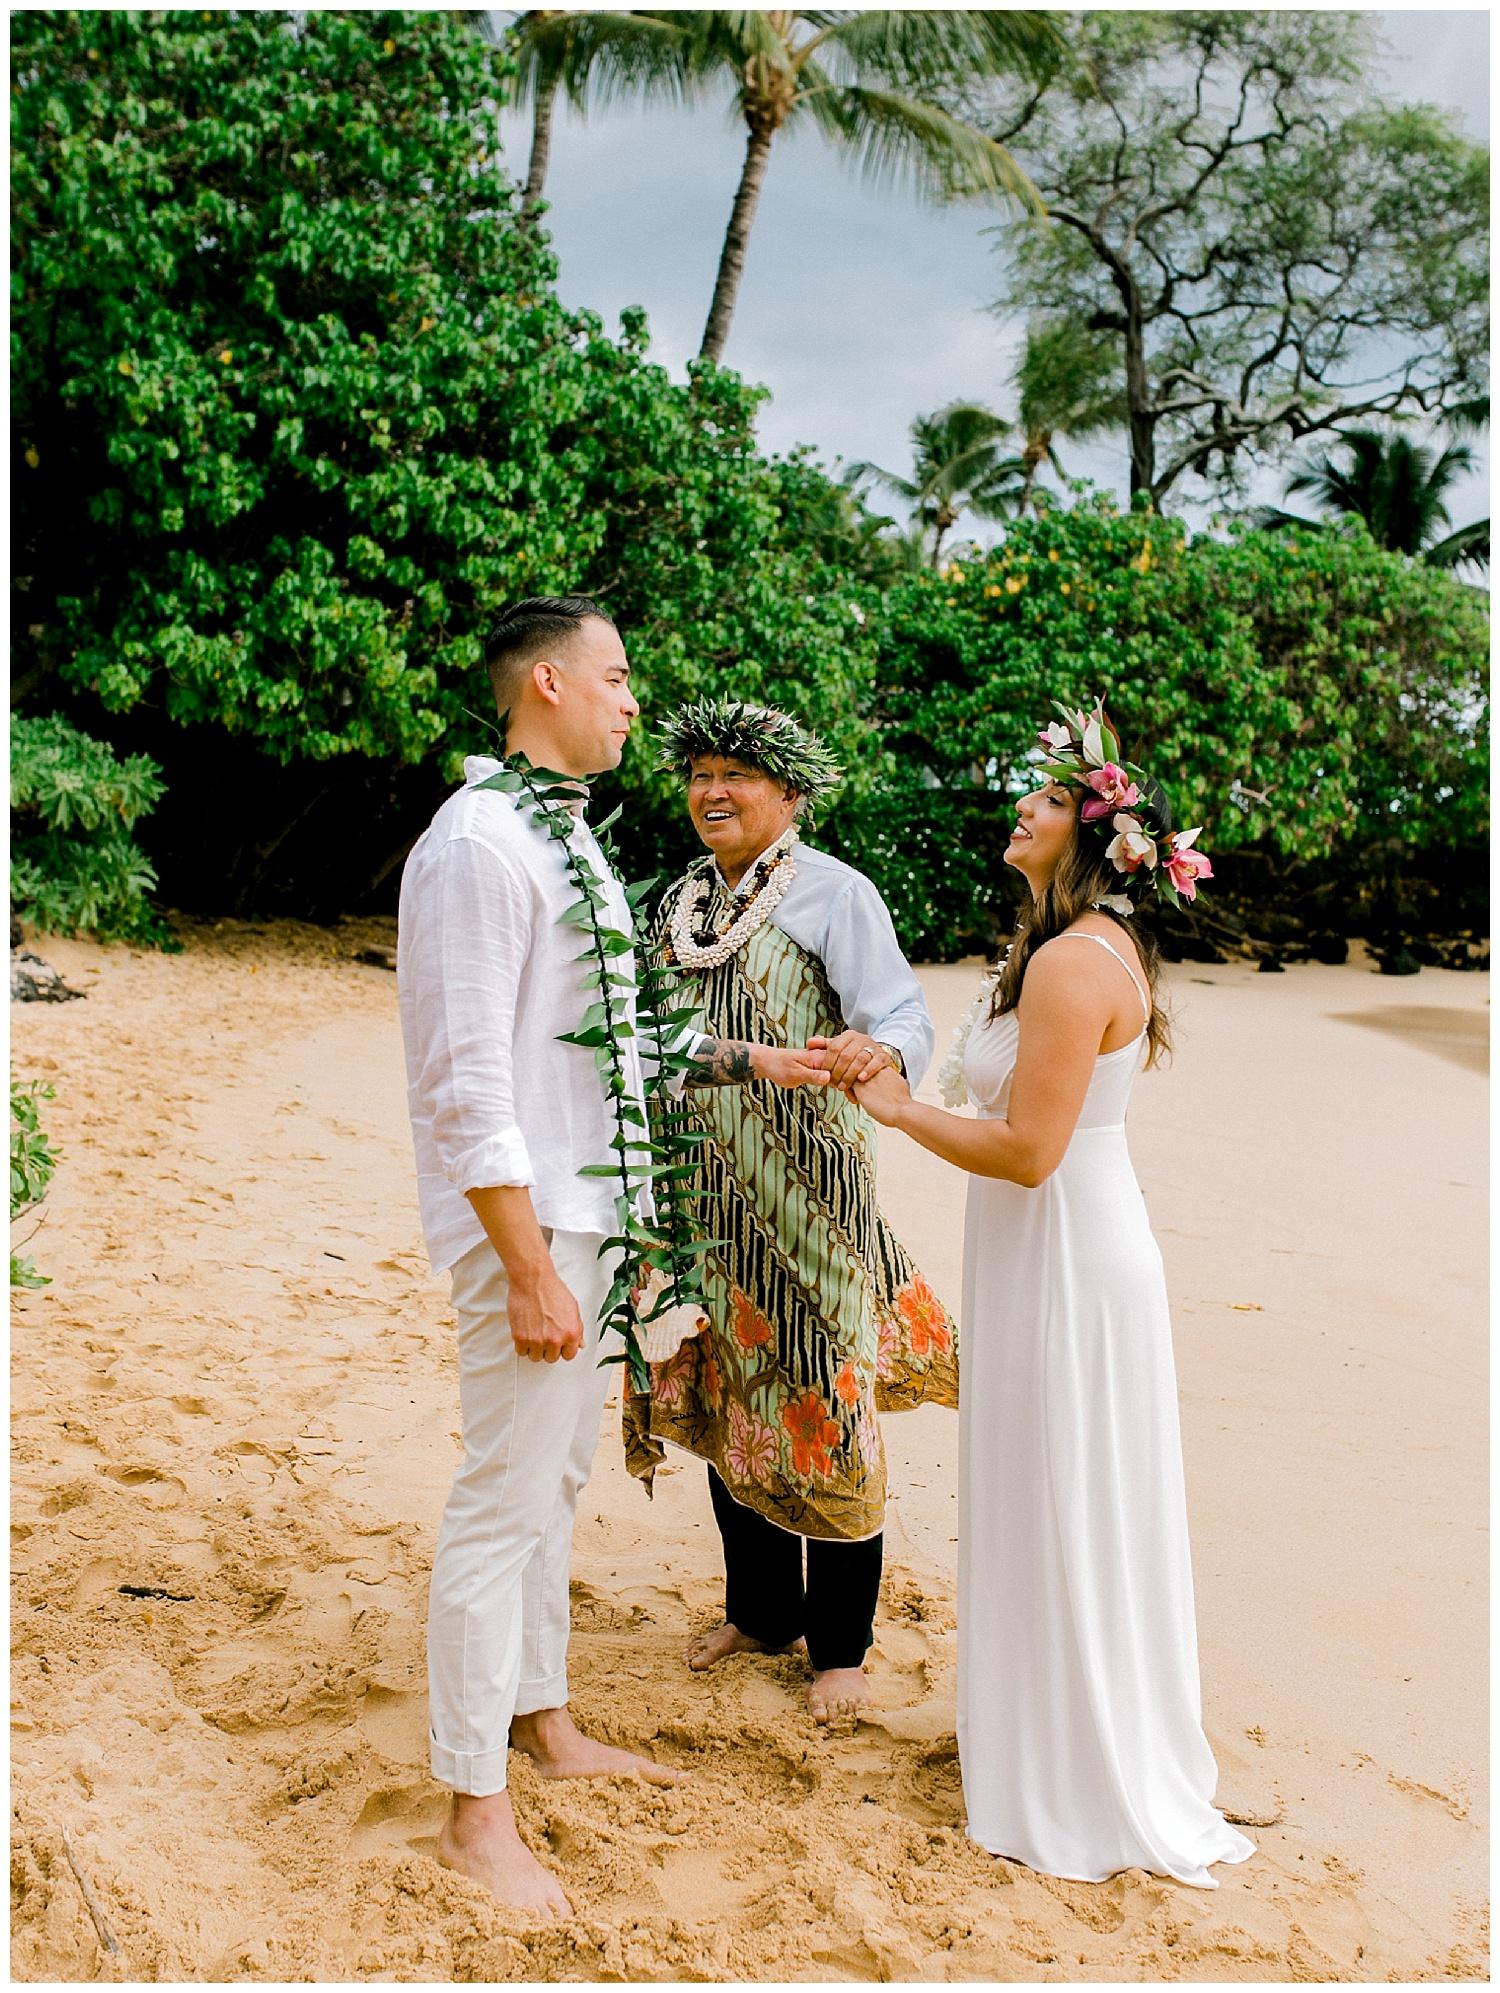 Maui-Elopement-Photography-Paipu-Beach-Maui_0077.jpg